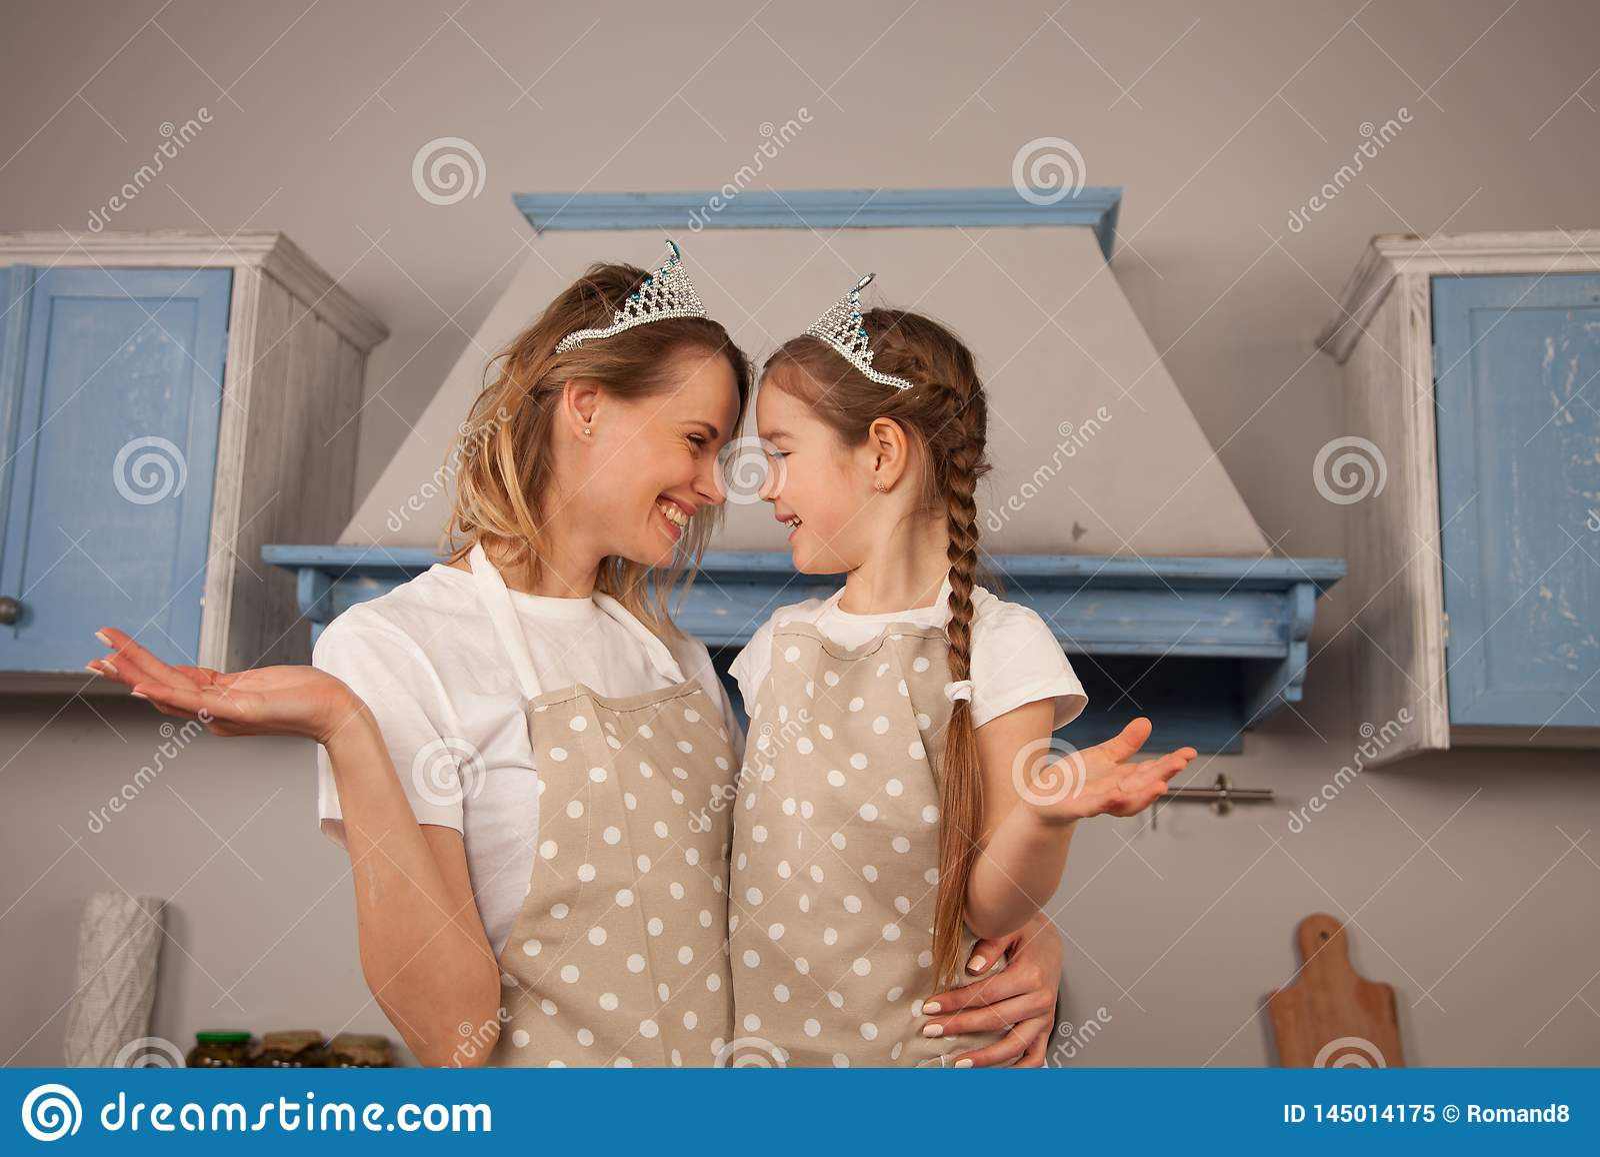 E 母亲和儿童女儿女孩有乐趣佩带的冠,看彼此